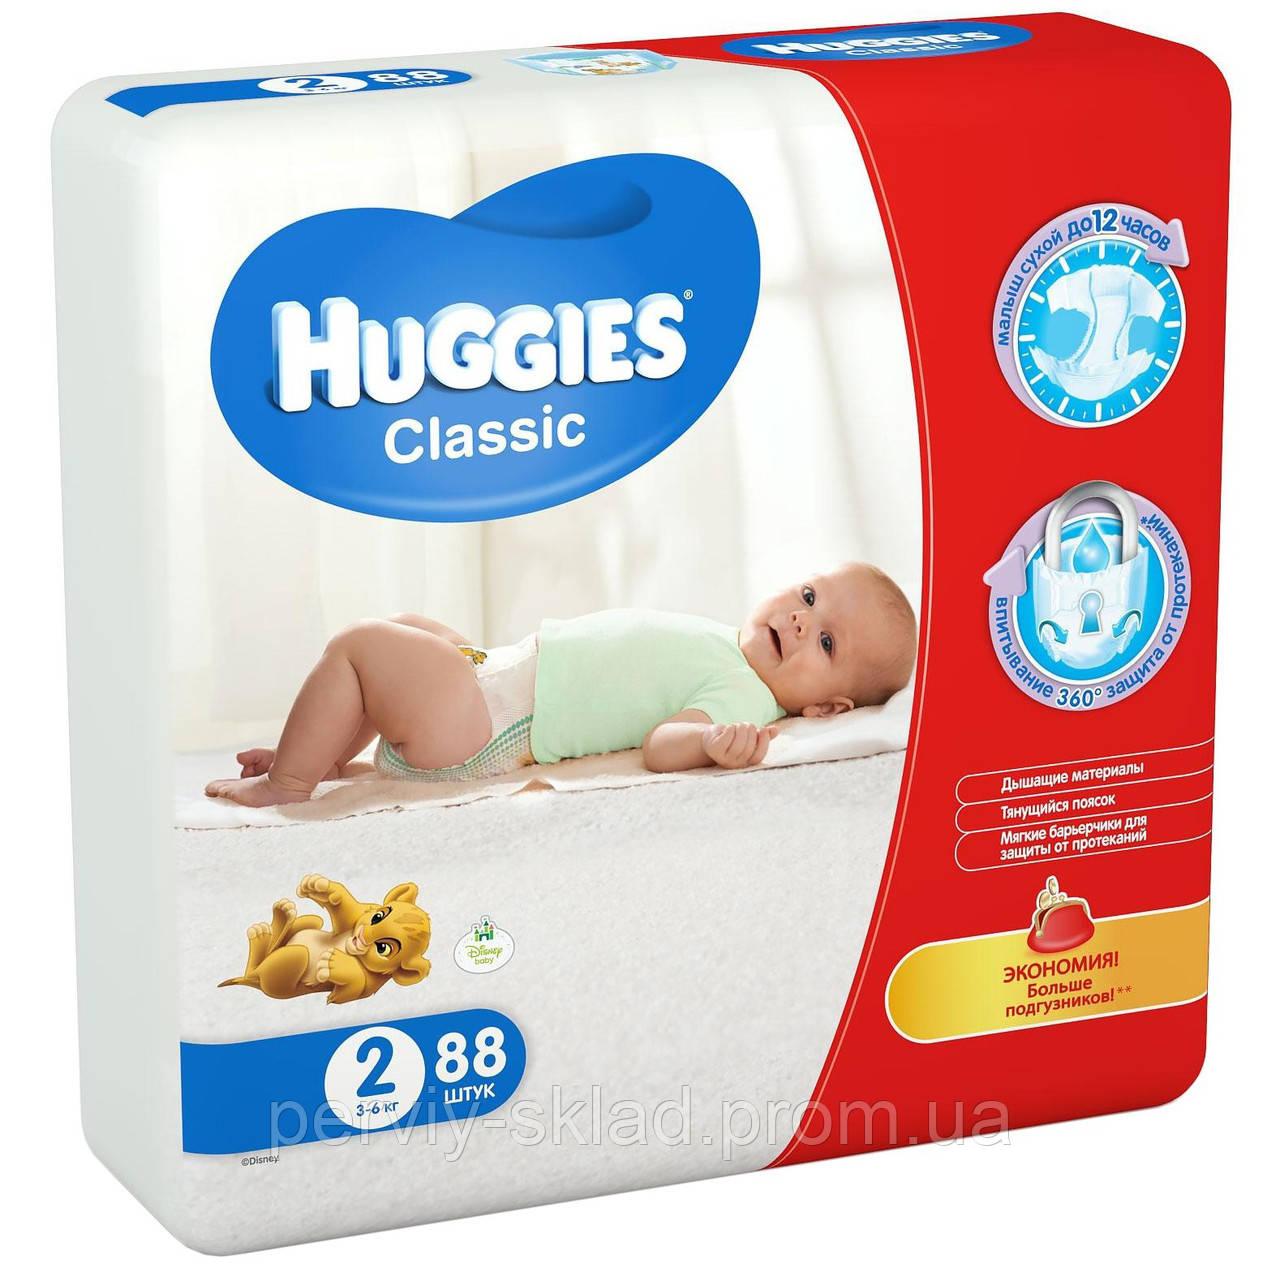 Подгузники Huggies Classic размер 2